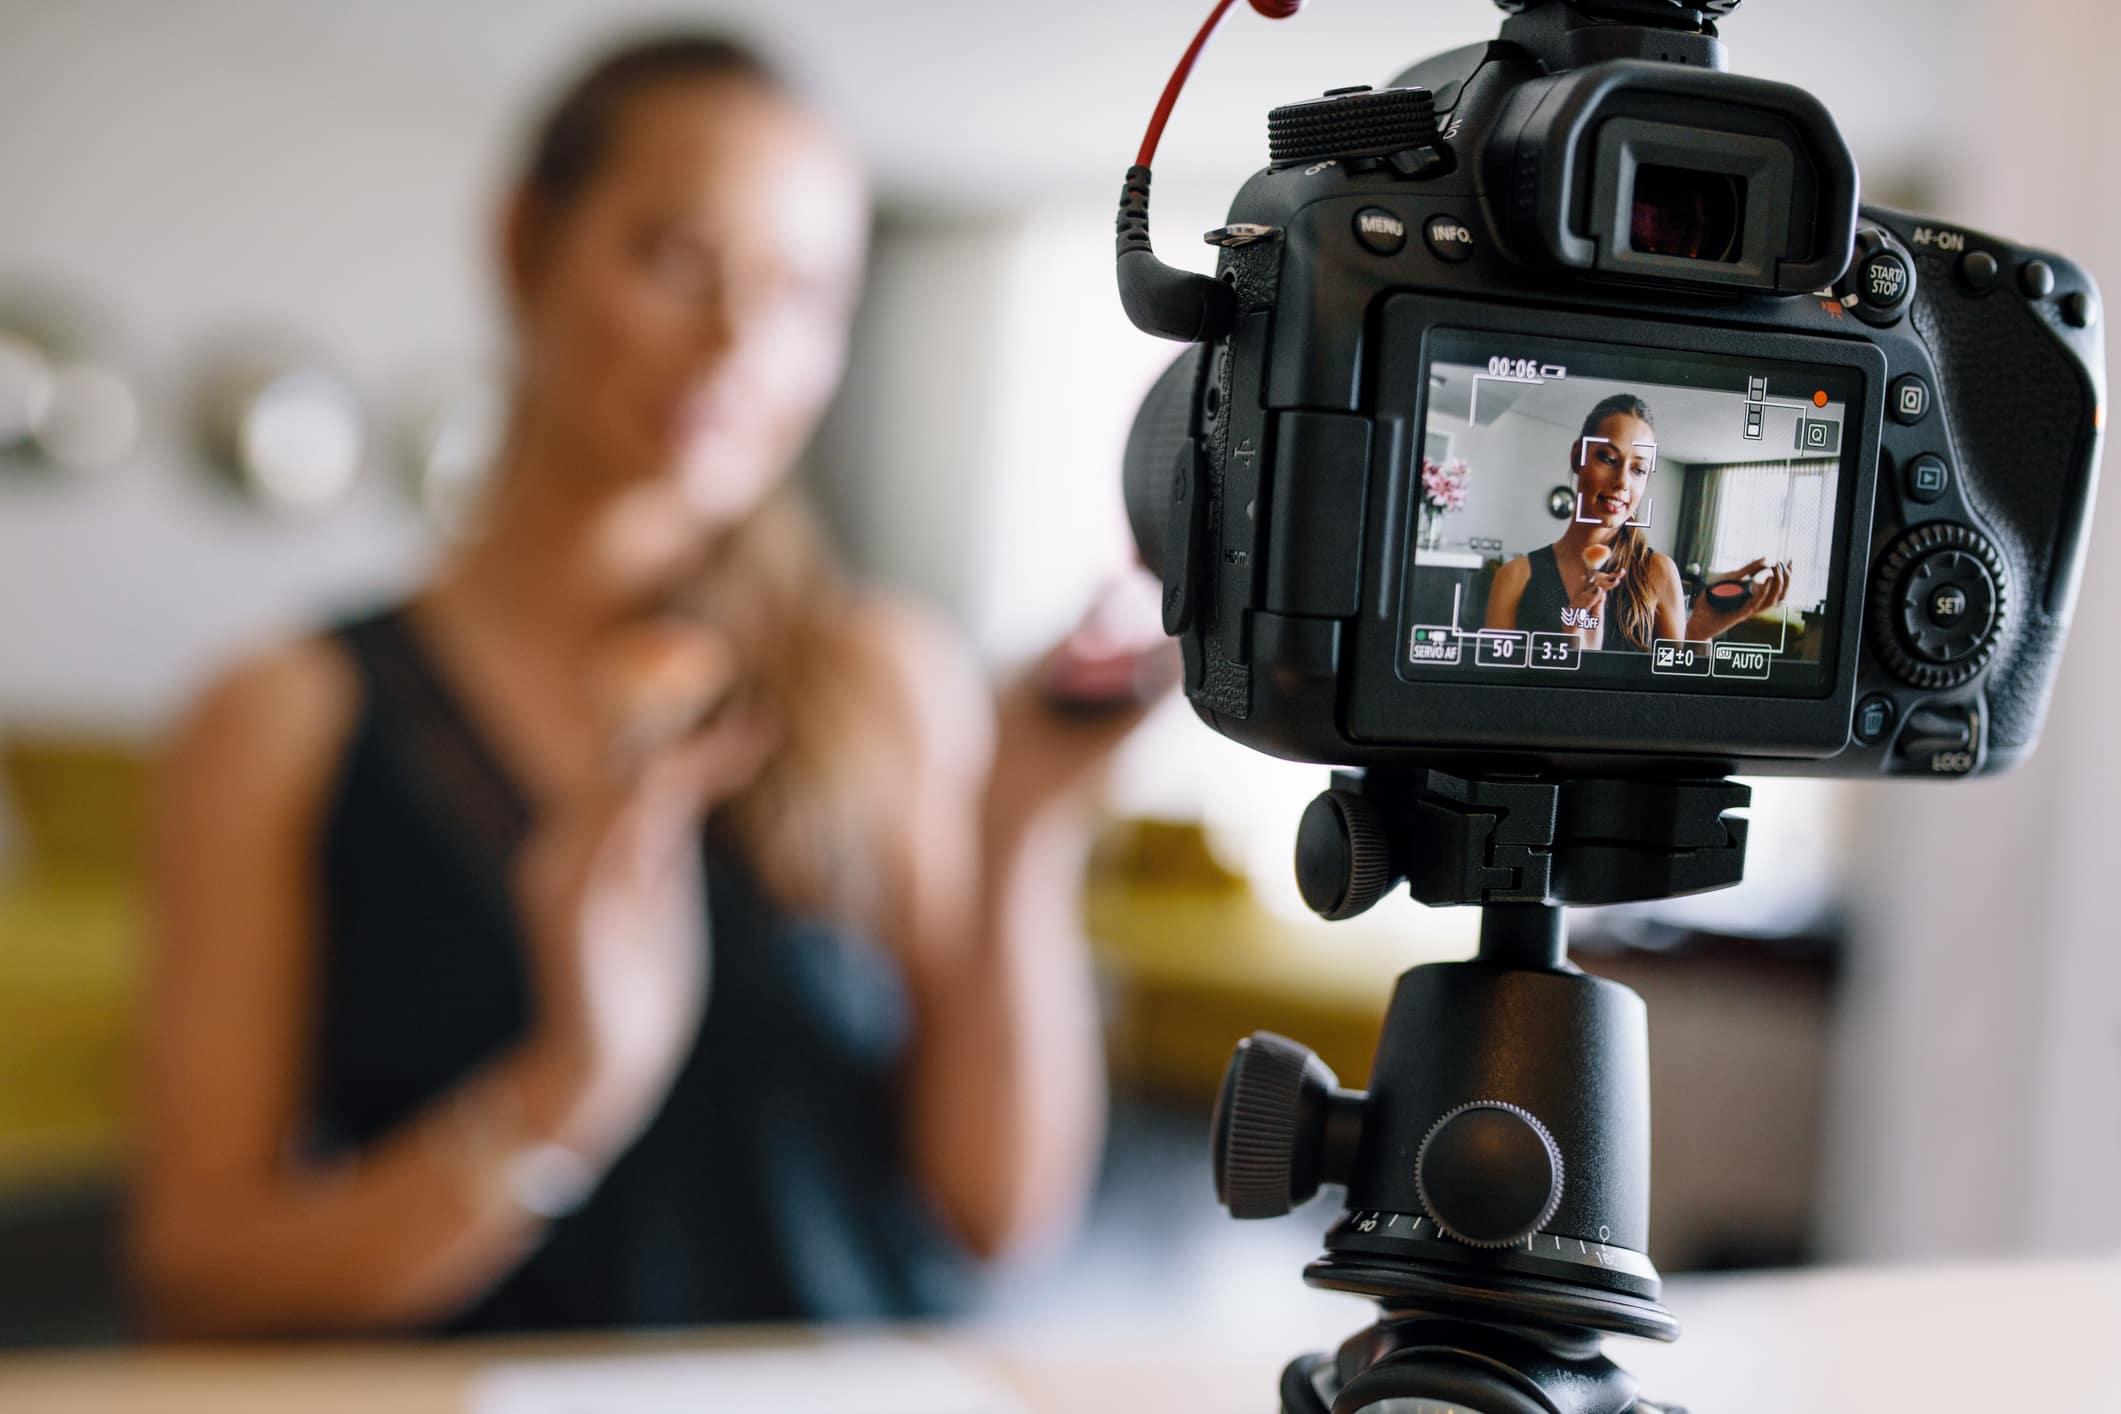 Top 6 Vlogging Cameras For Creating Videos